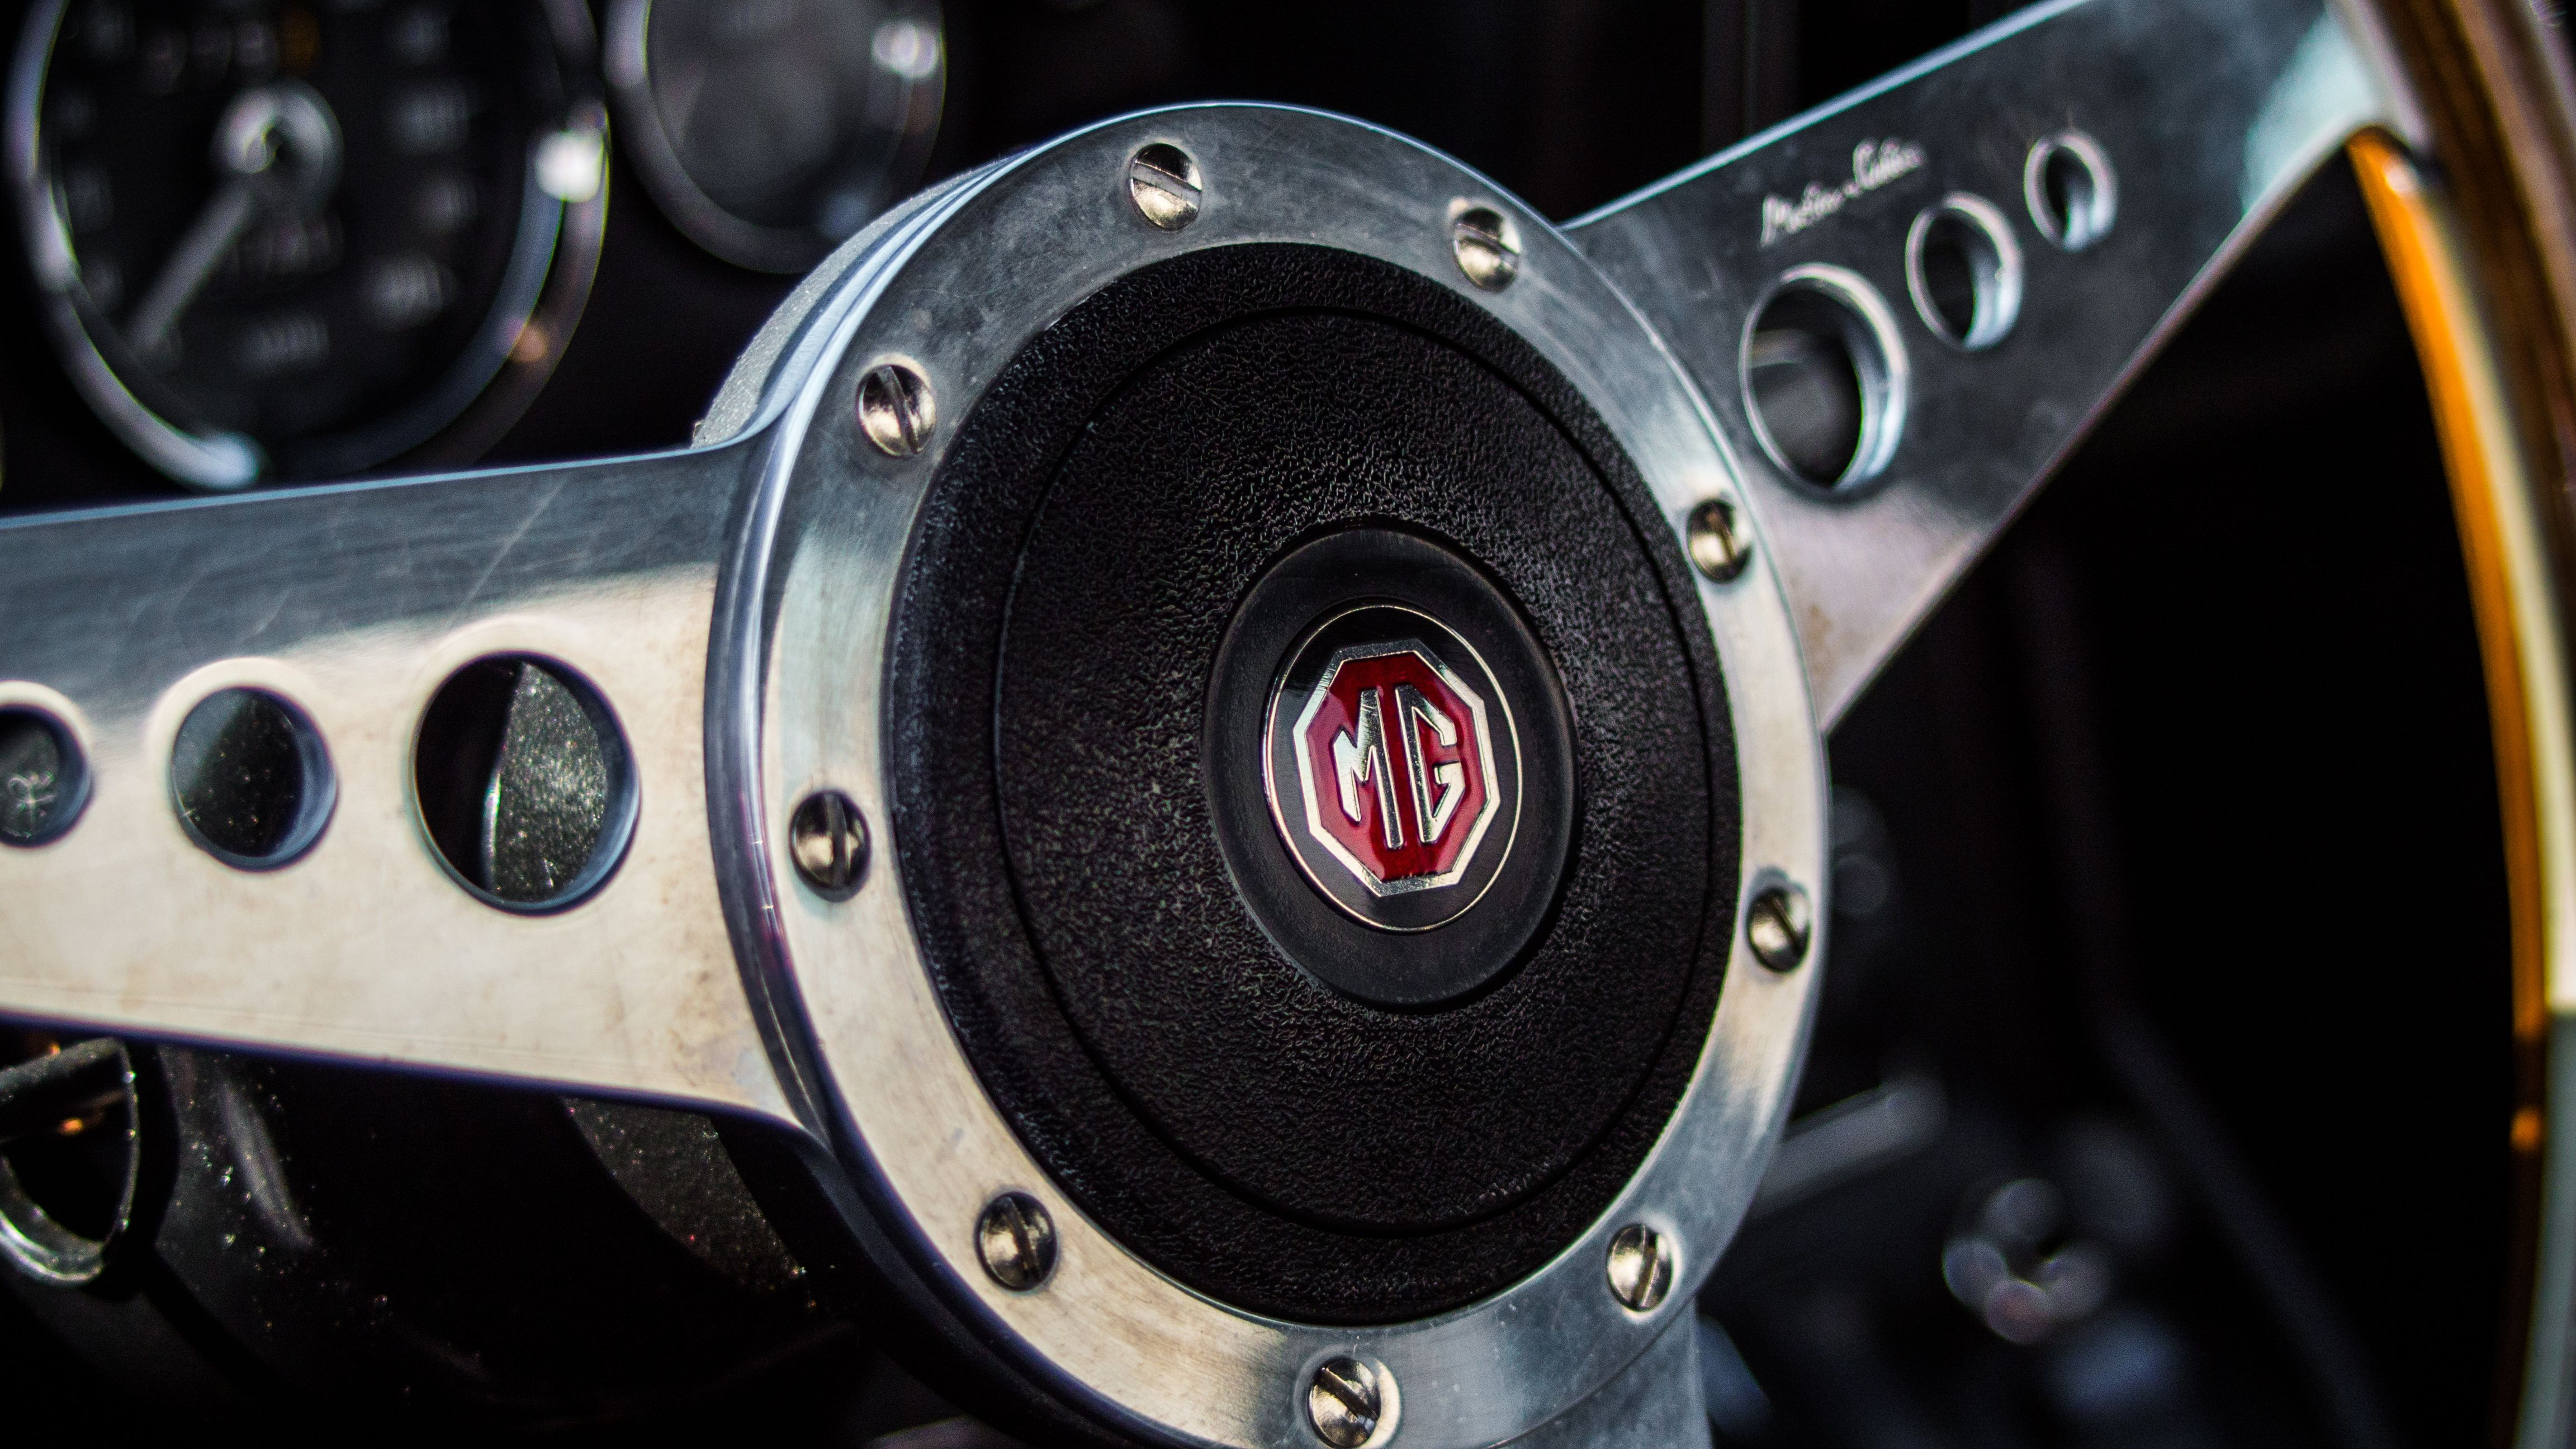 revauto | vente de MG, Triumph